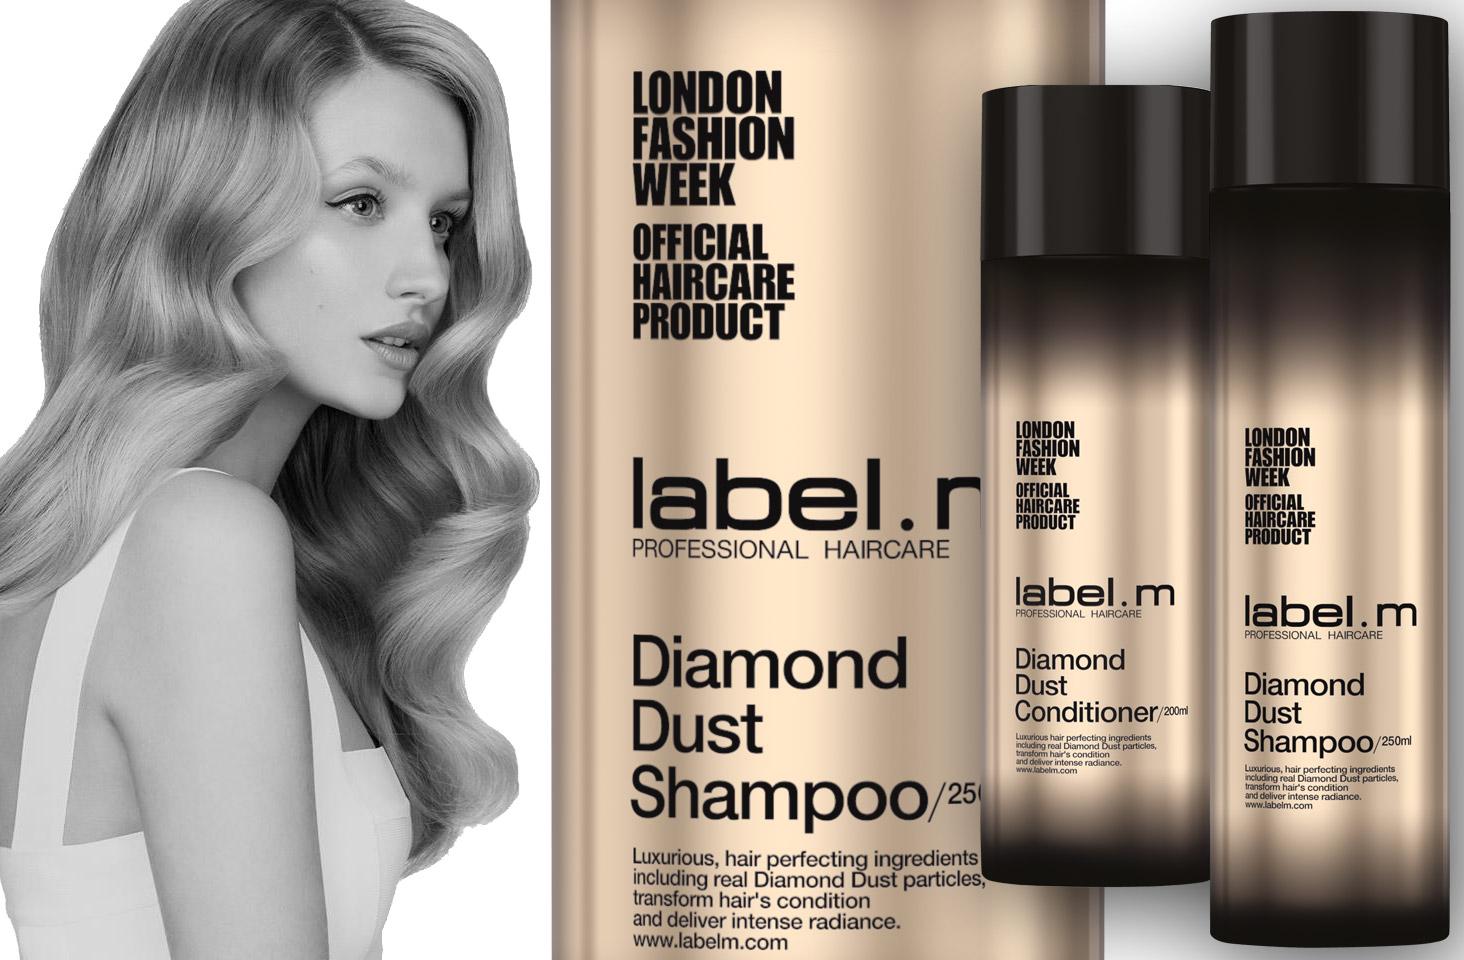 label.m Diamond Dust Shampoo & Conditioner